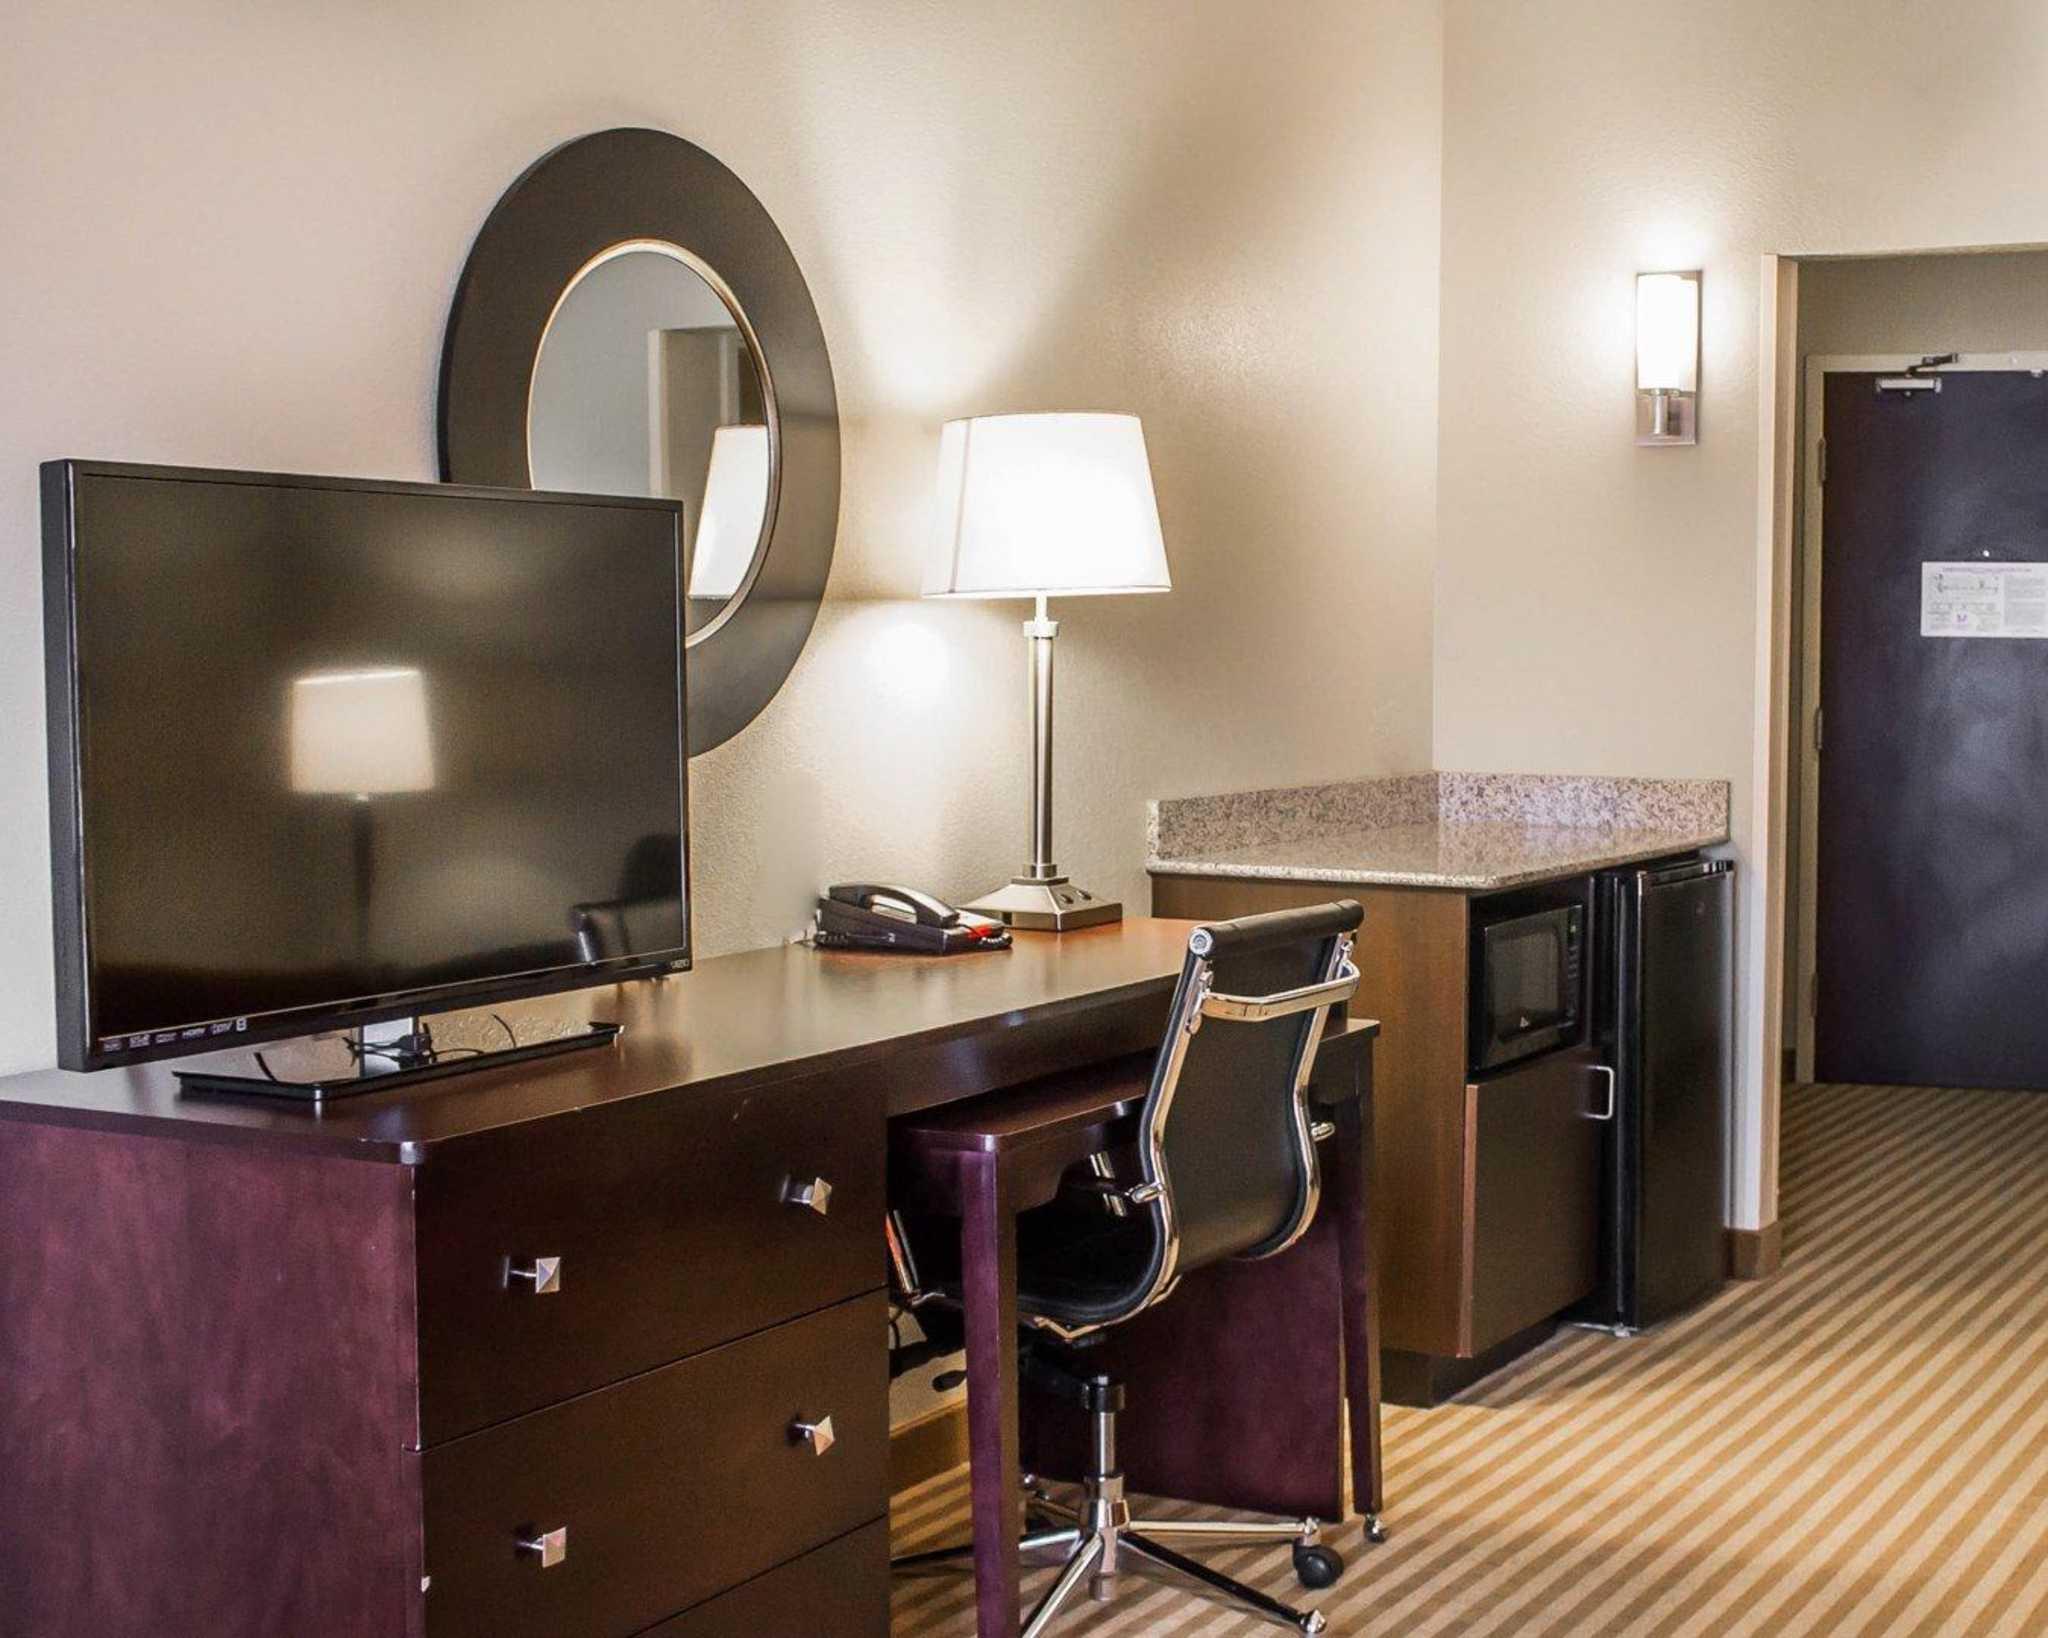 Comfort Suites East Broad at 270 image 24